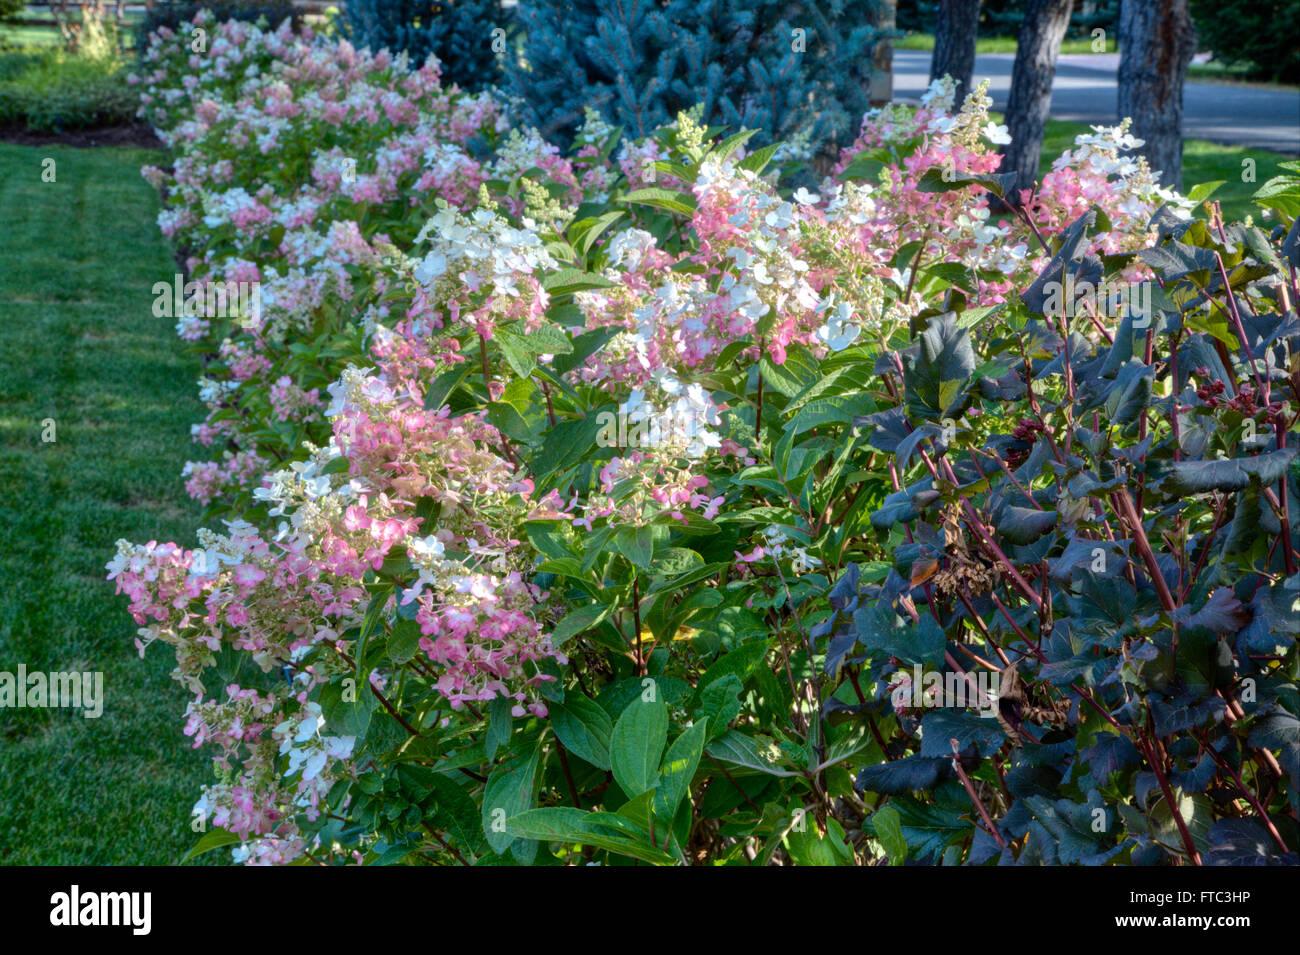 Border With Hydrangea Stock Photos Border With Hydrangea Stock